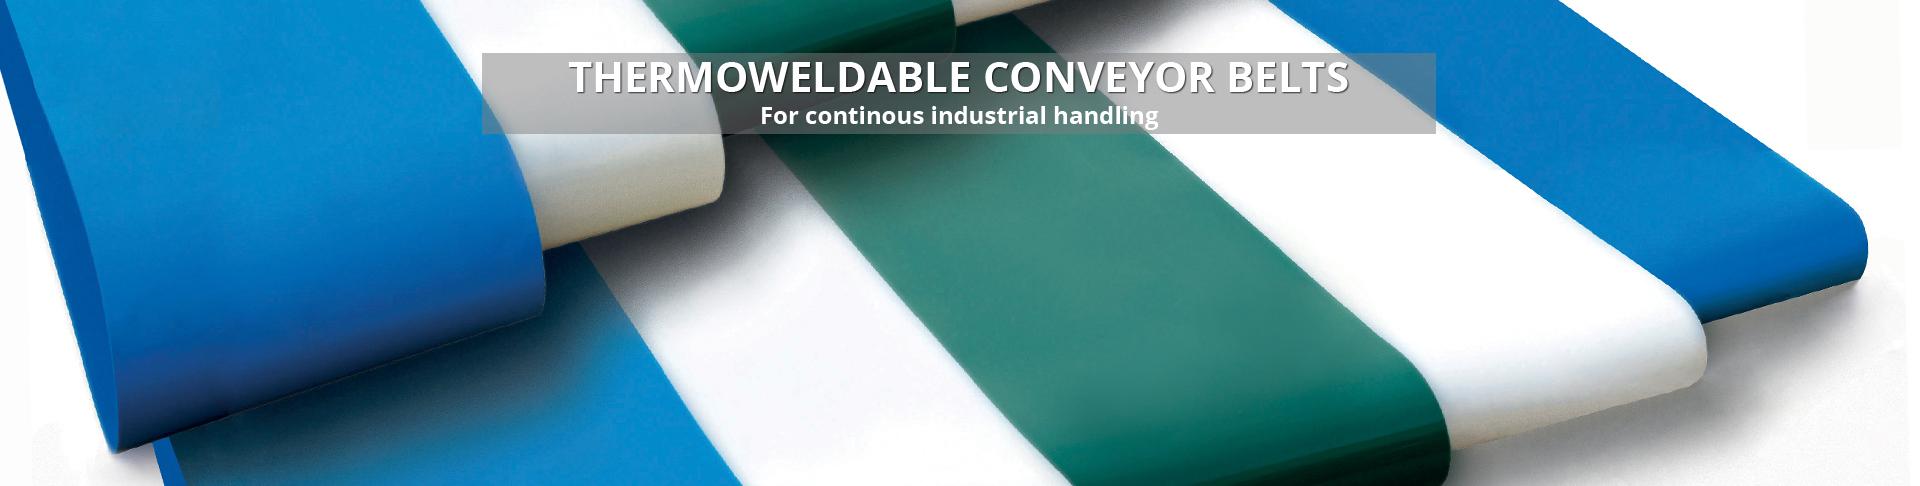 thermoweldable-conveyor-belts-slide